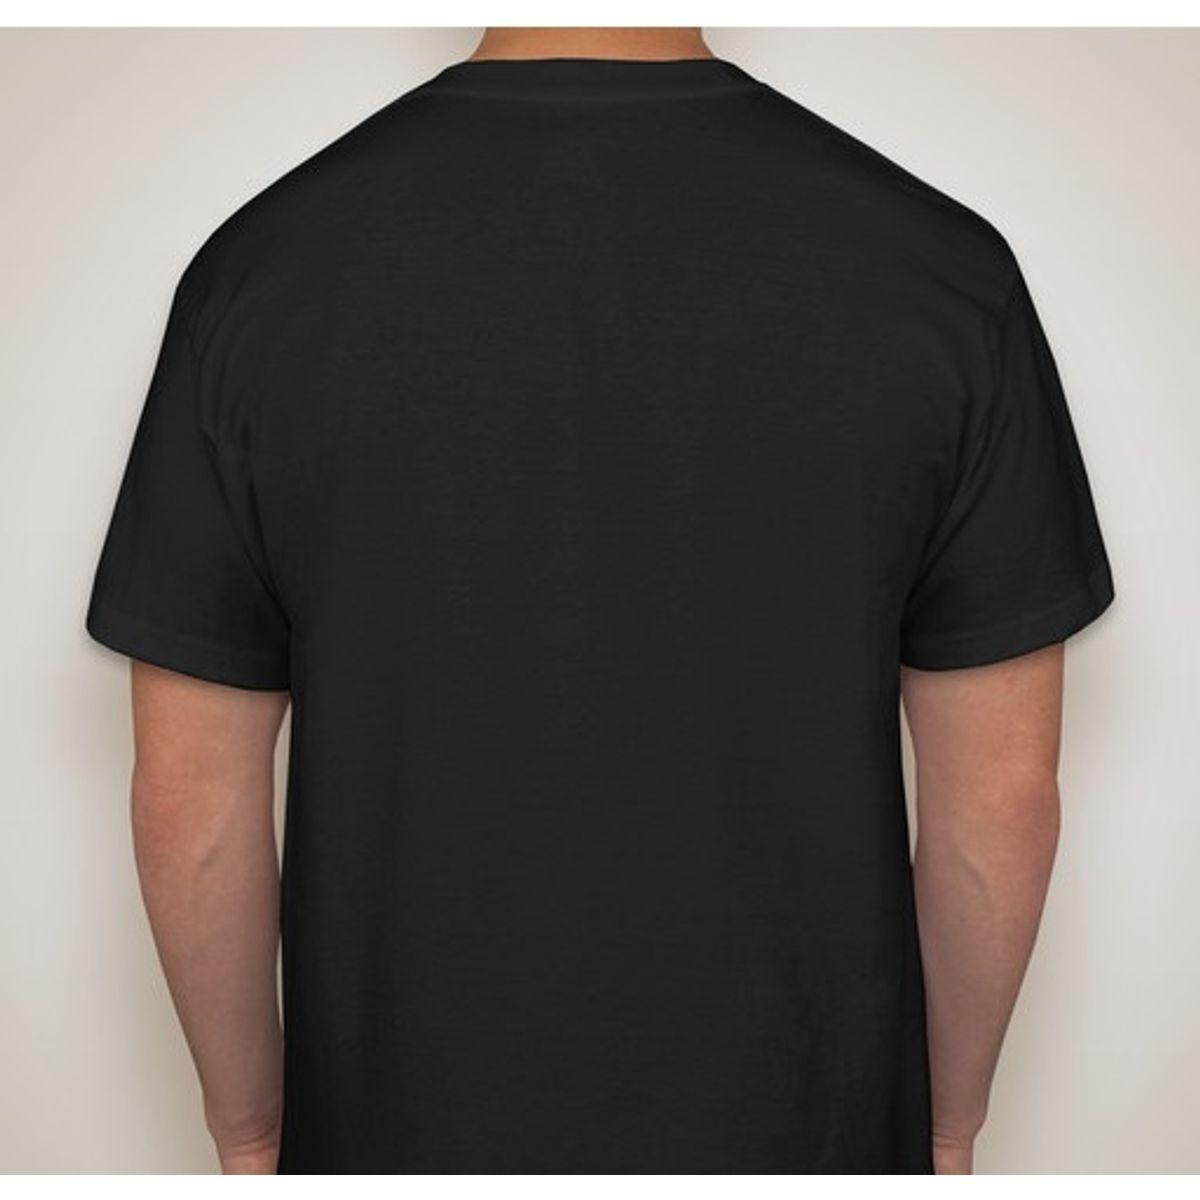 Drake OVO Black Owl T-shirt